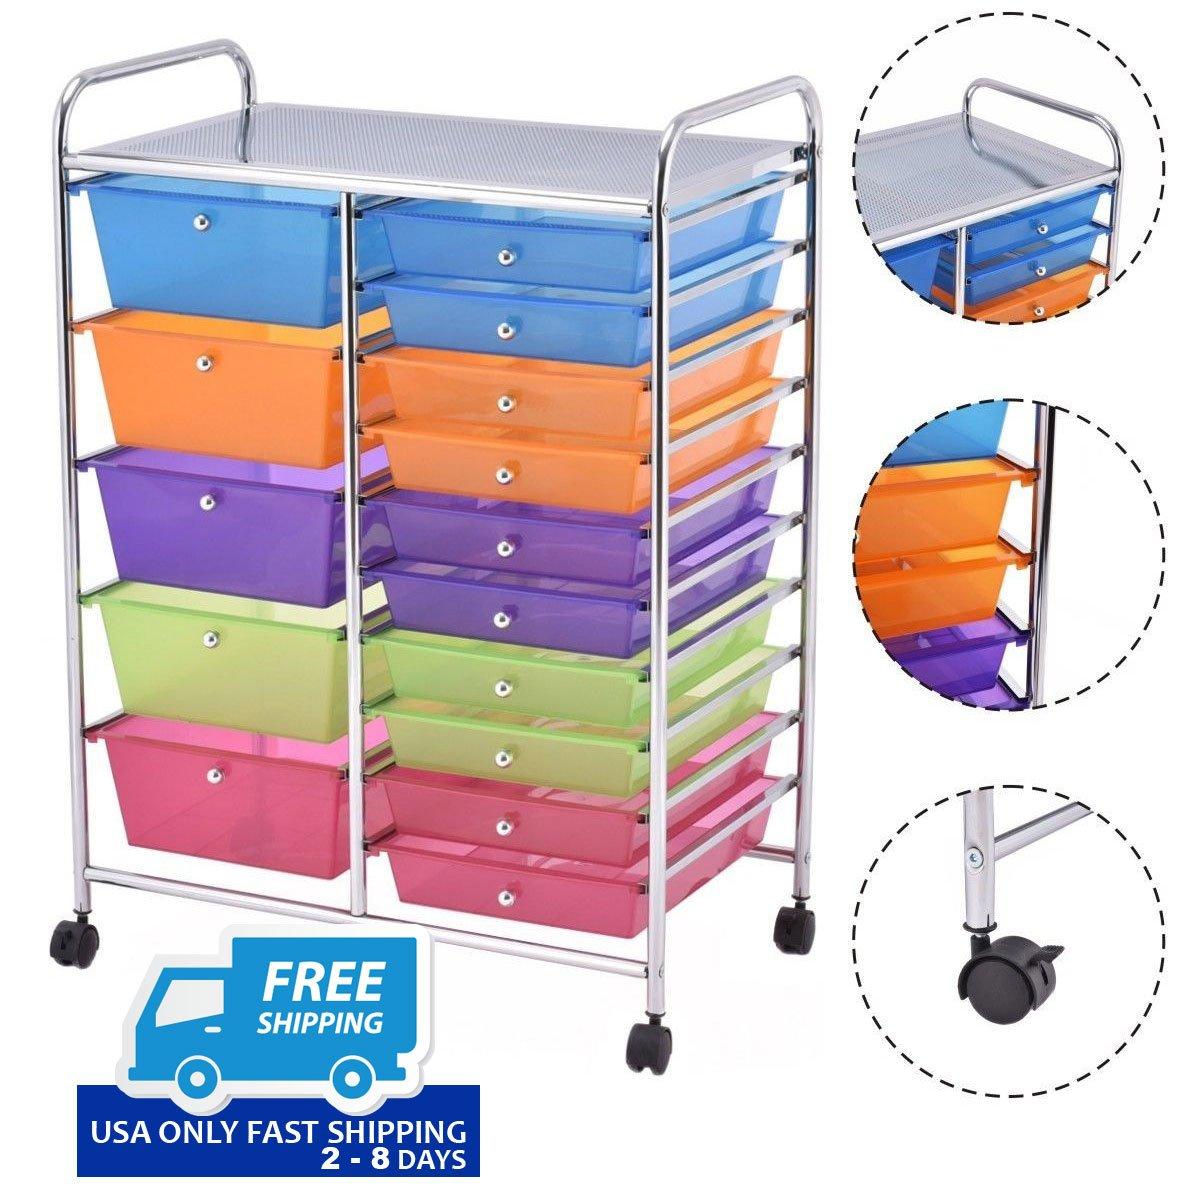 15 Drawers Rolling Storage Cart Organizer  sc 1 st  By Choice Products & 15 Drawers Rolling Storage Cart Organizer u2013 By Choice Products